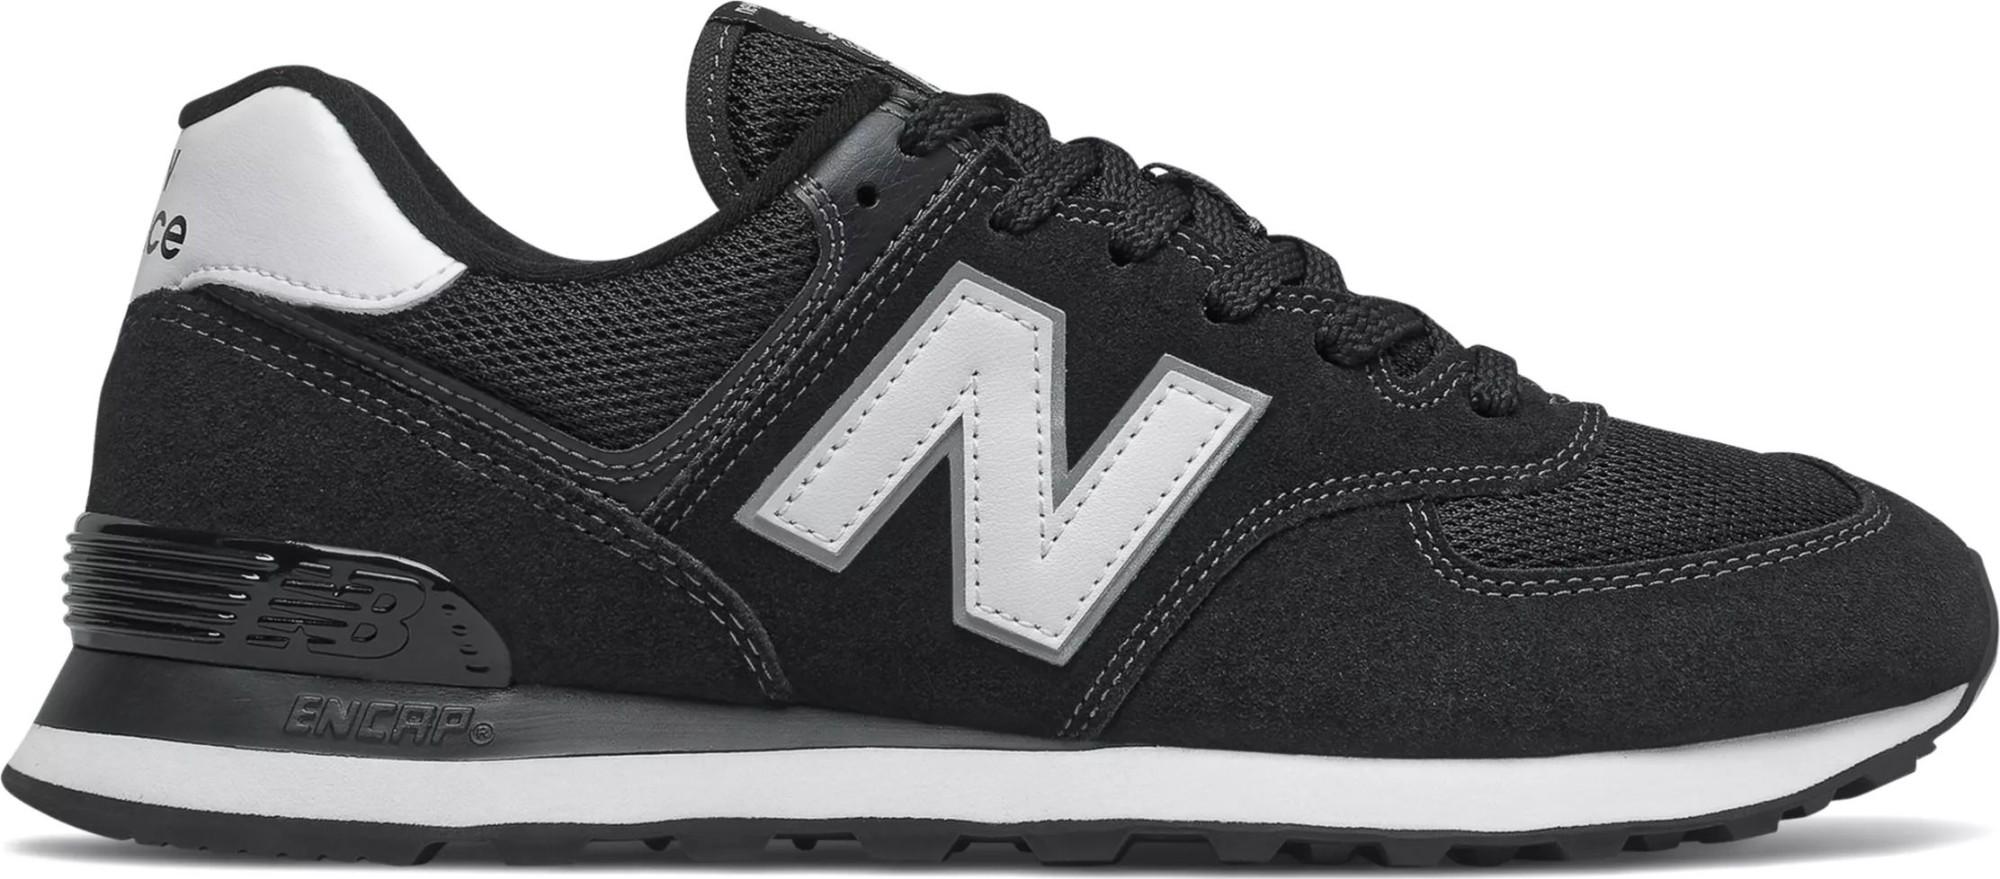 New Balance ML574 T2 Black/White EE2 37